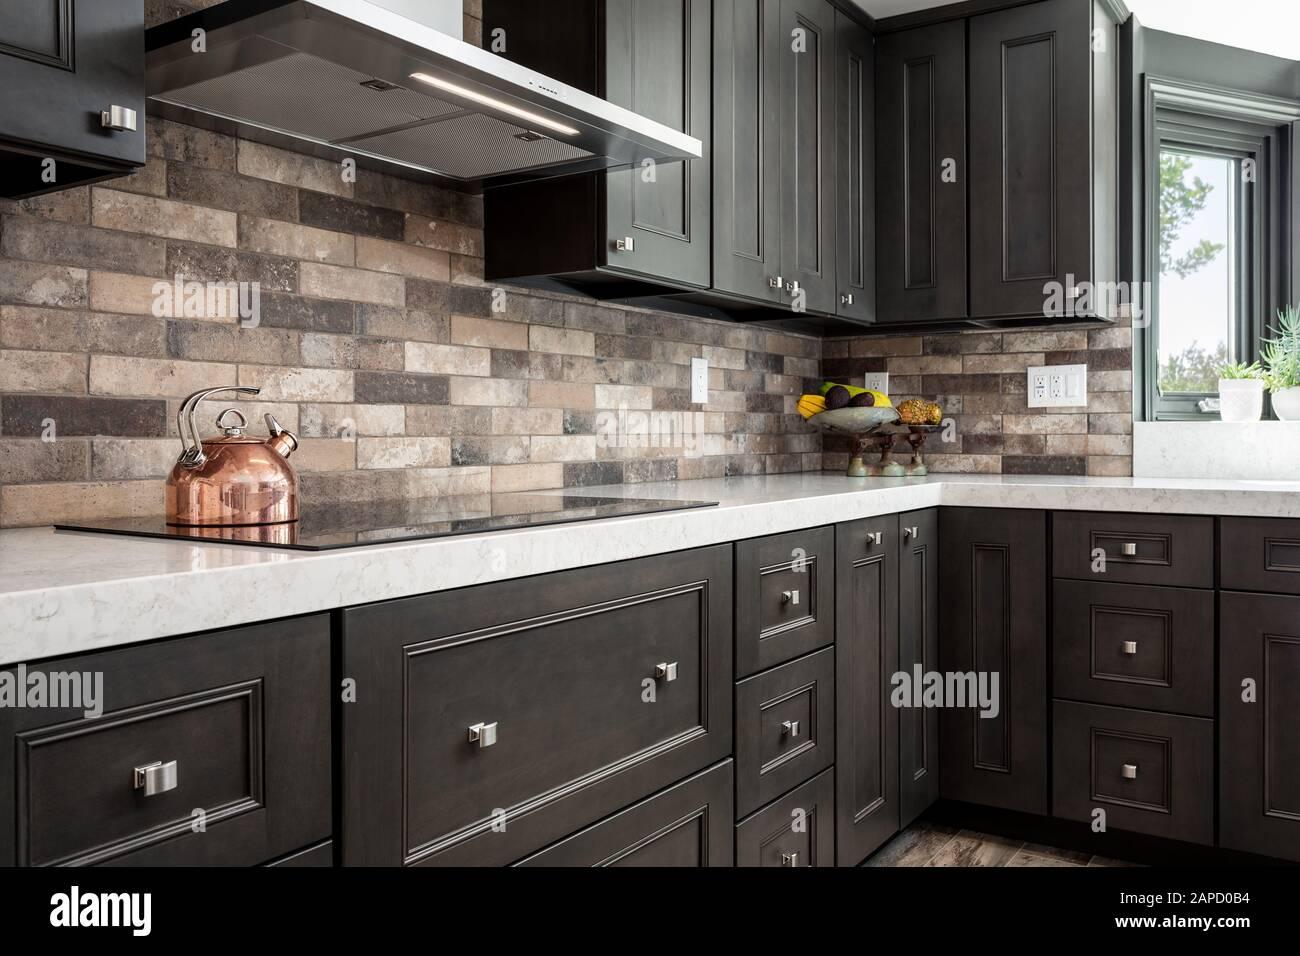 - Dark Kitchen Cabinets And Stone Backsplash Stock Photo - Alamy